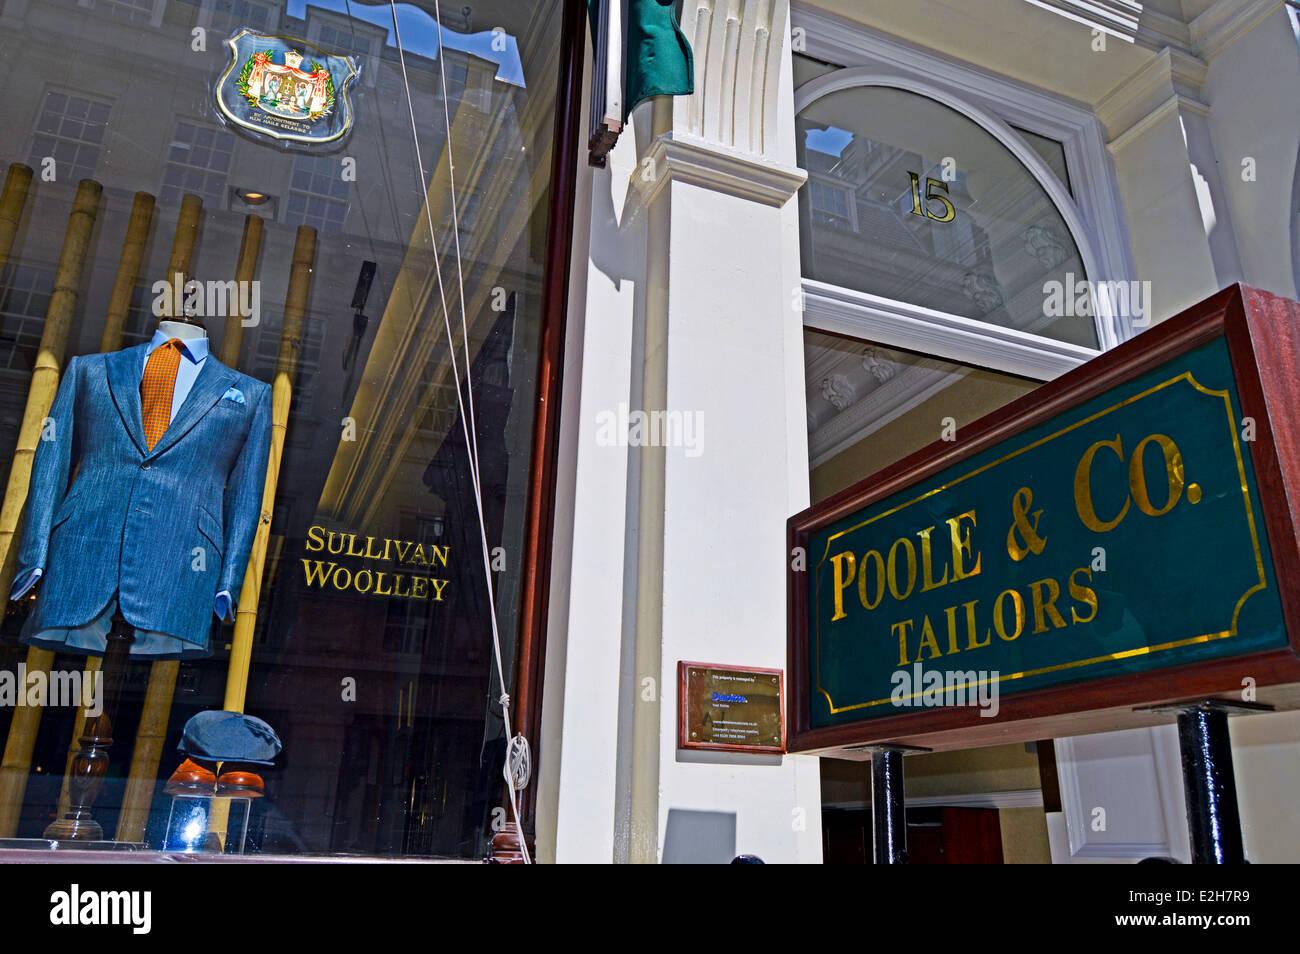 Bespoke Tailors on Savile Row, Mayfair, City of Westminster, London, England, United Kingdom - Stock Image